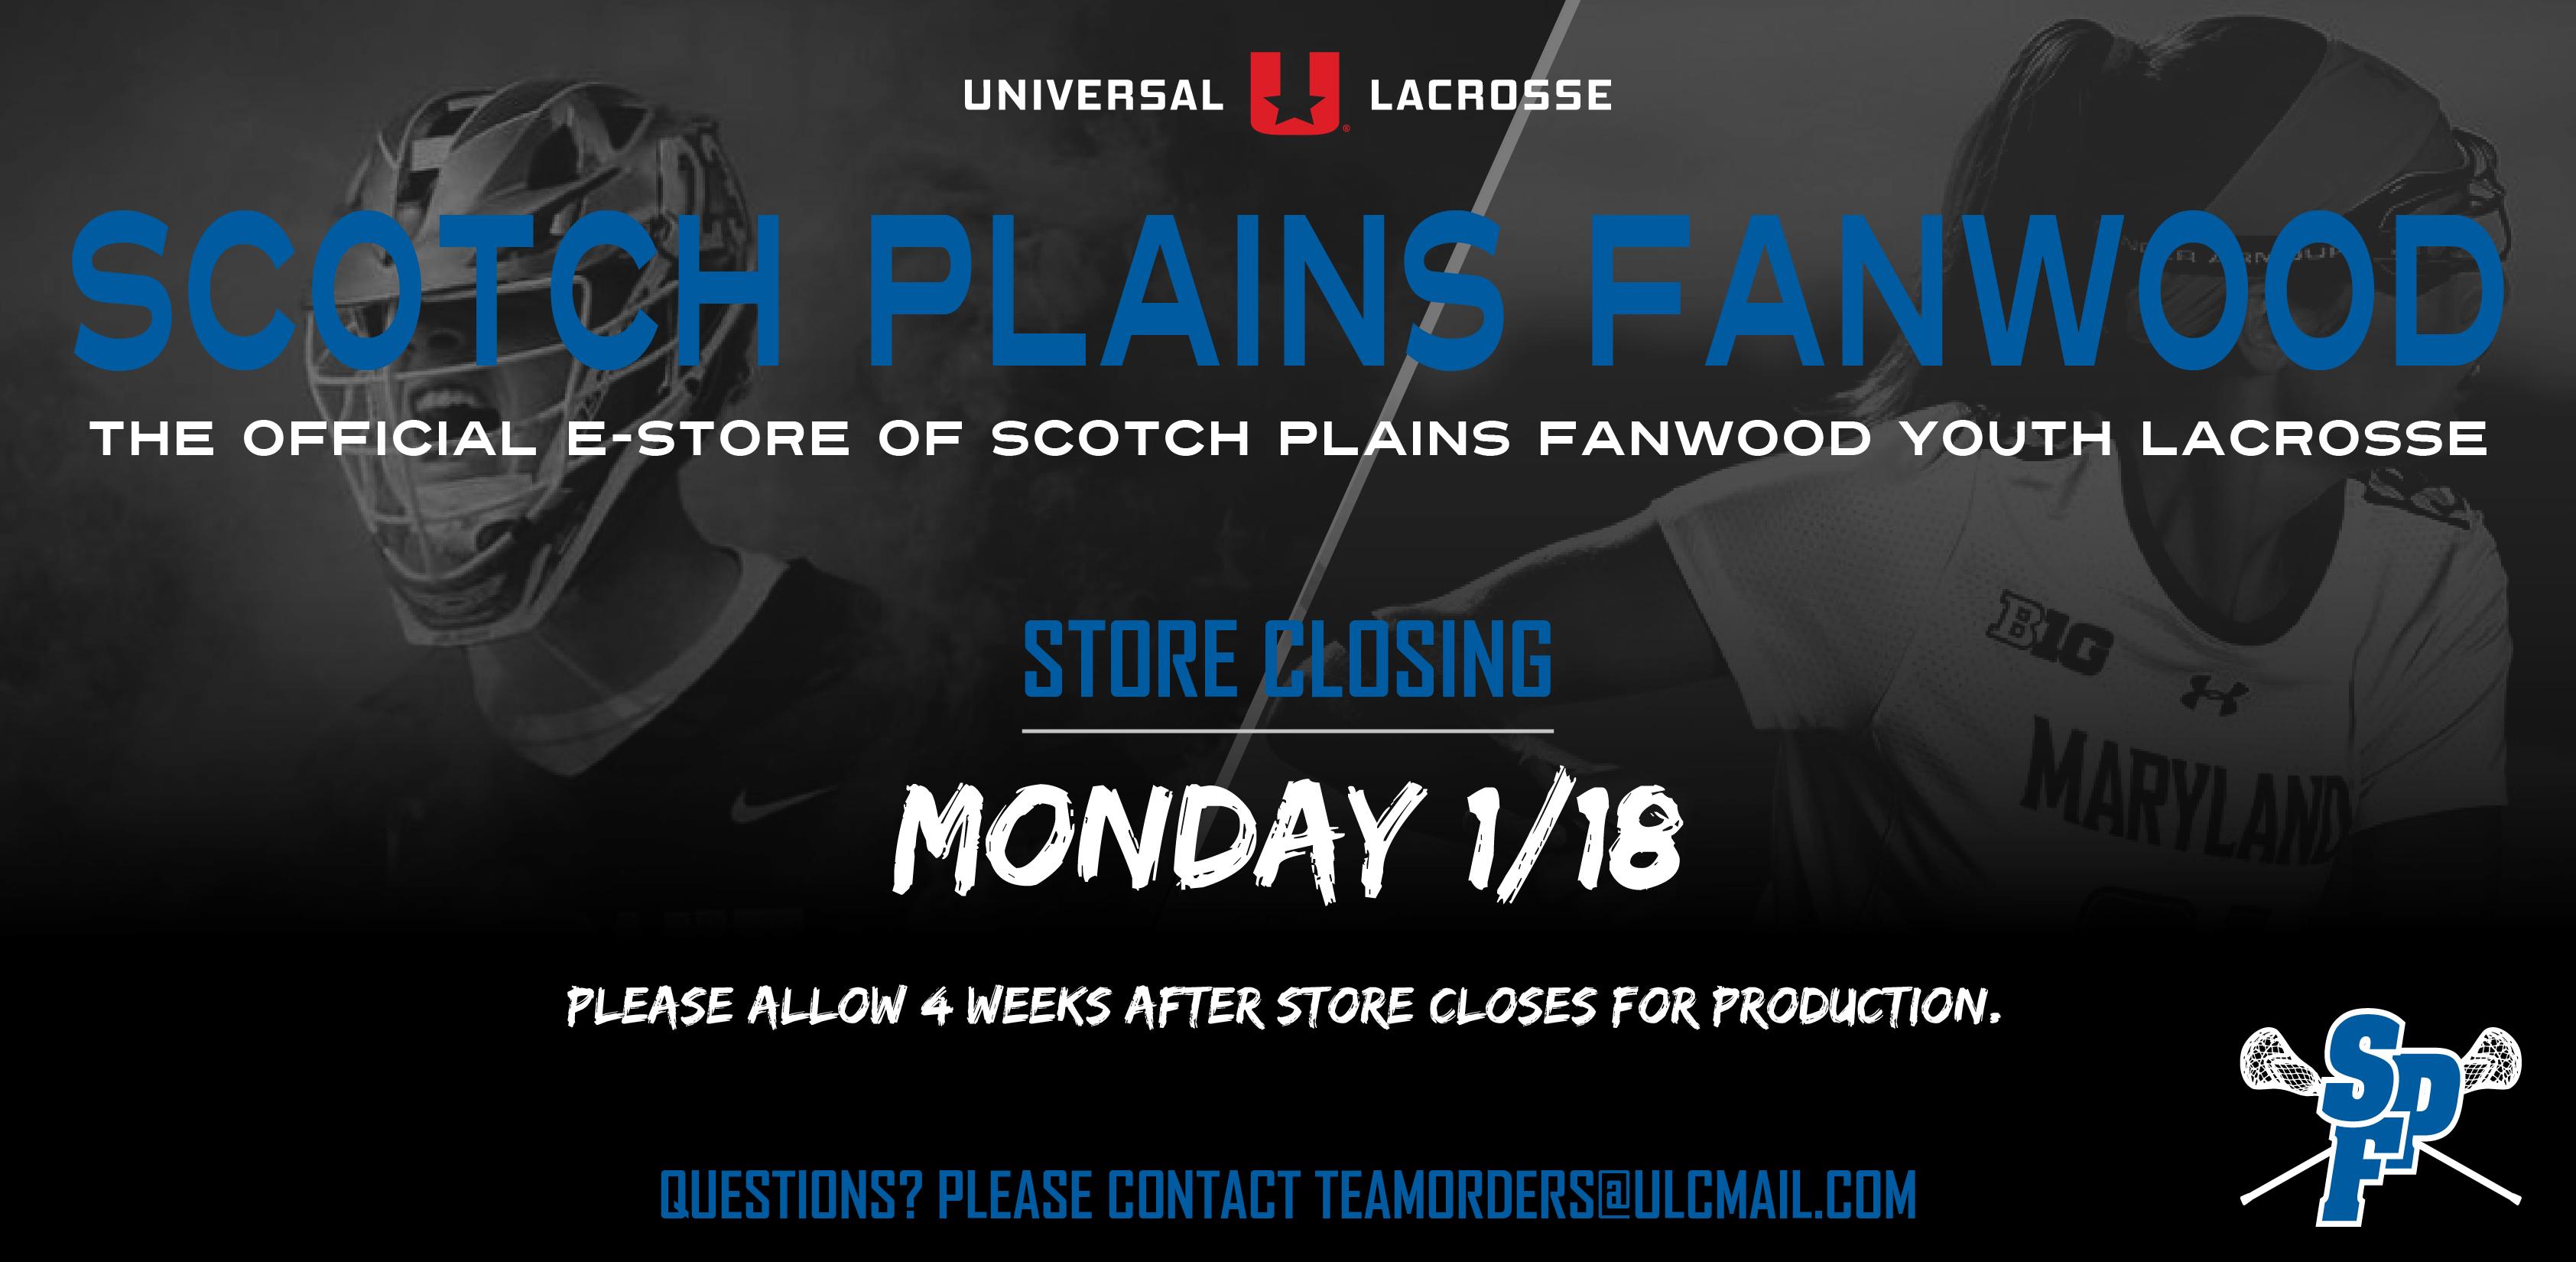 Scotch Plains Fanwood Youth Lacrosse